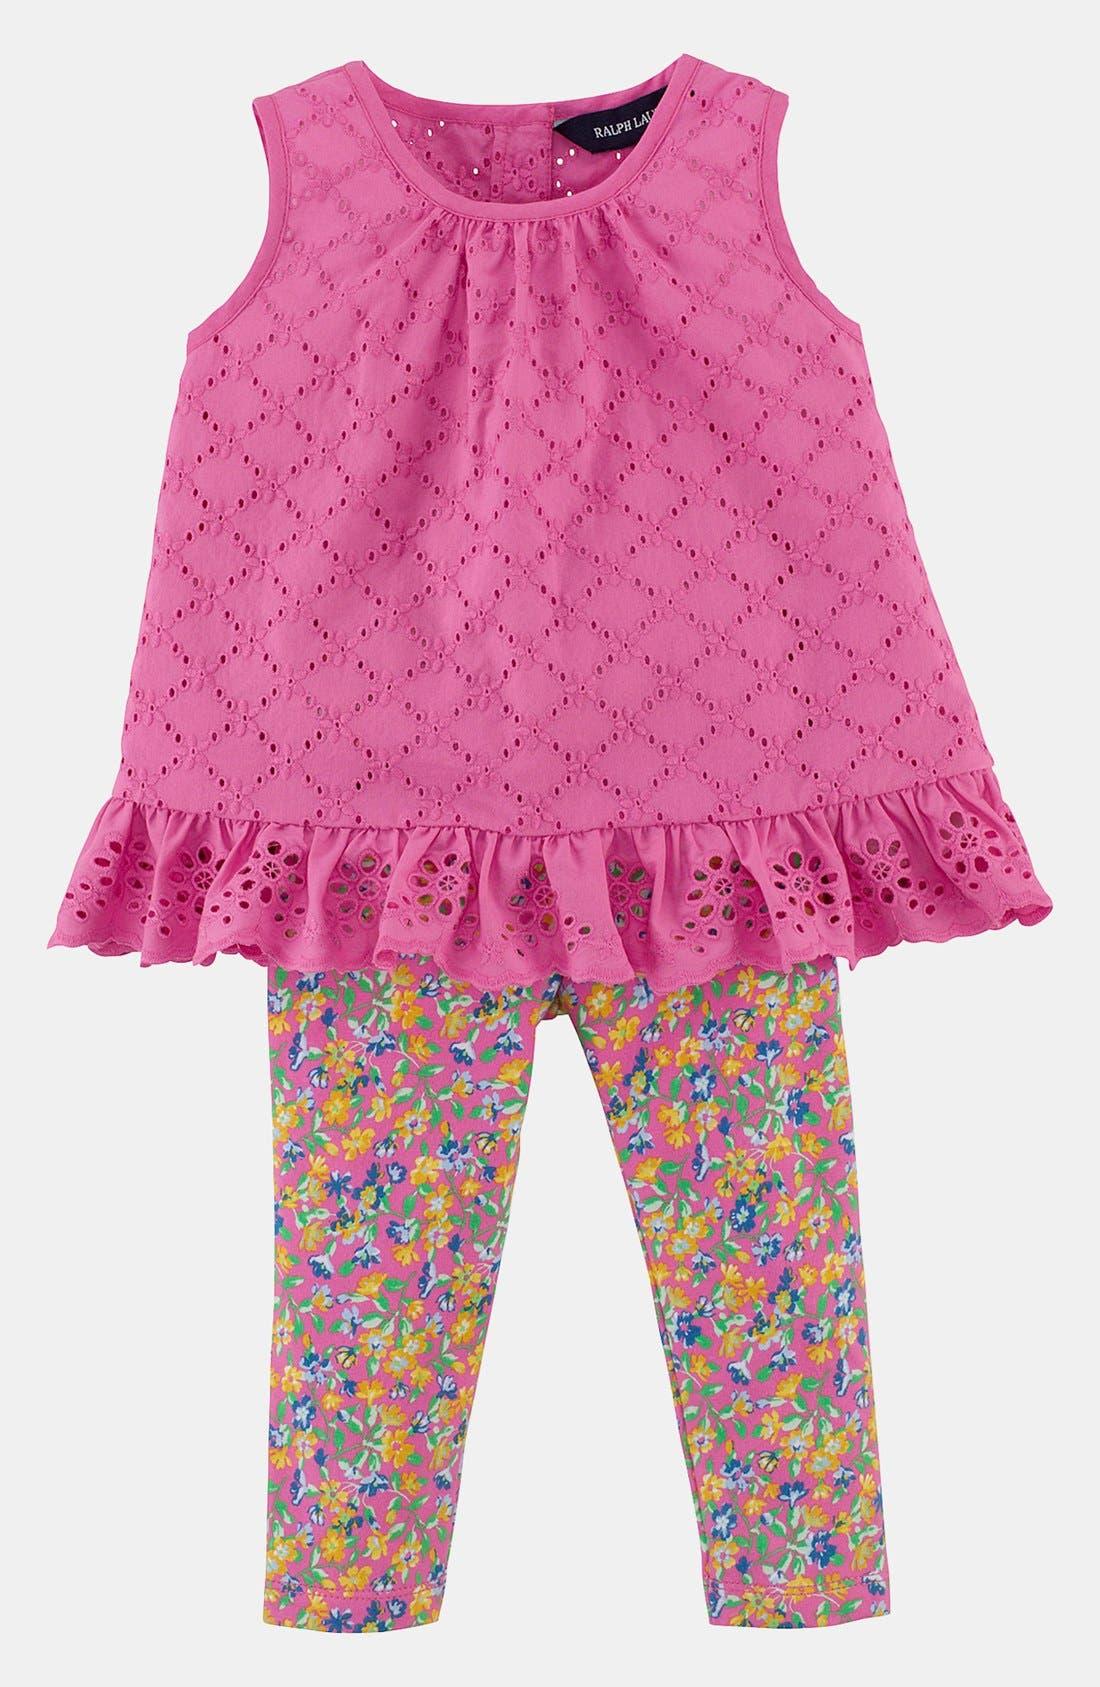 Main Image - Ralph Lauren Eyelet Top & Leggings (Baby)